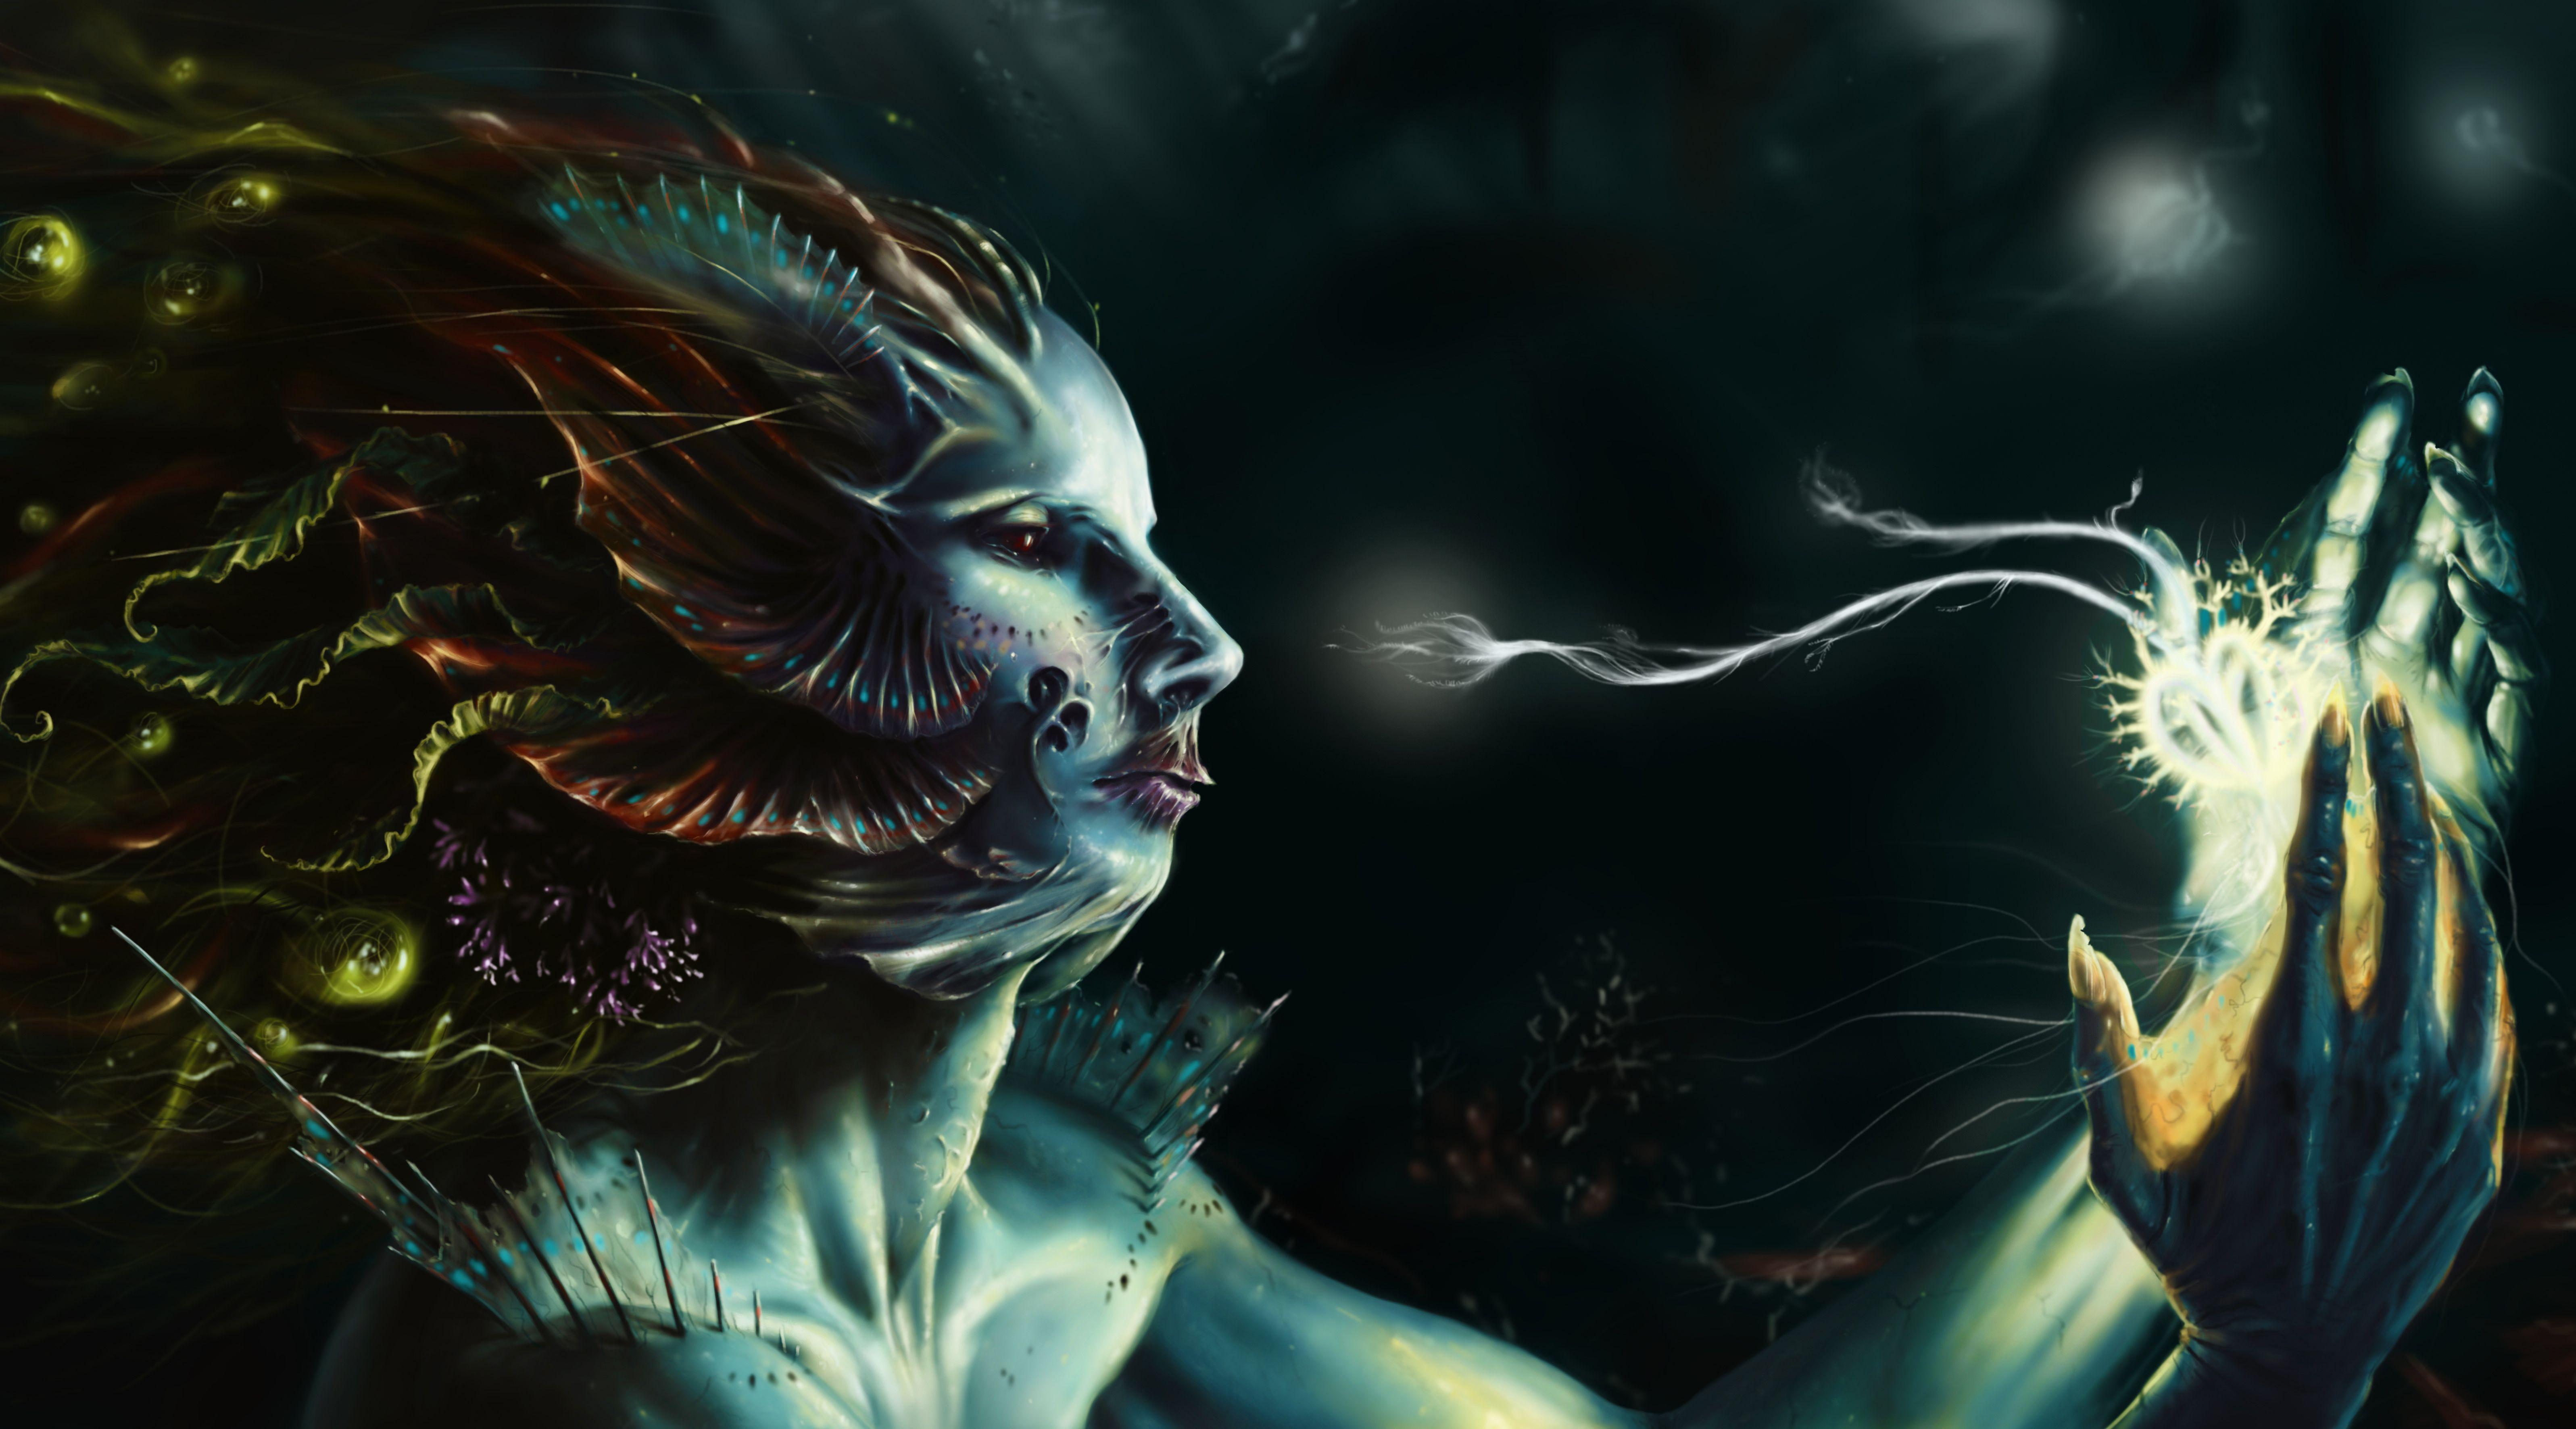 Dark Mermaid Art http://morgainelefee.d...